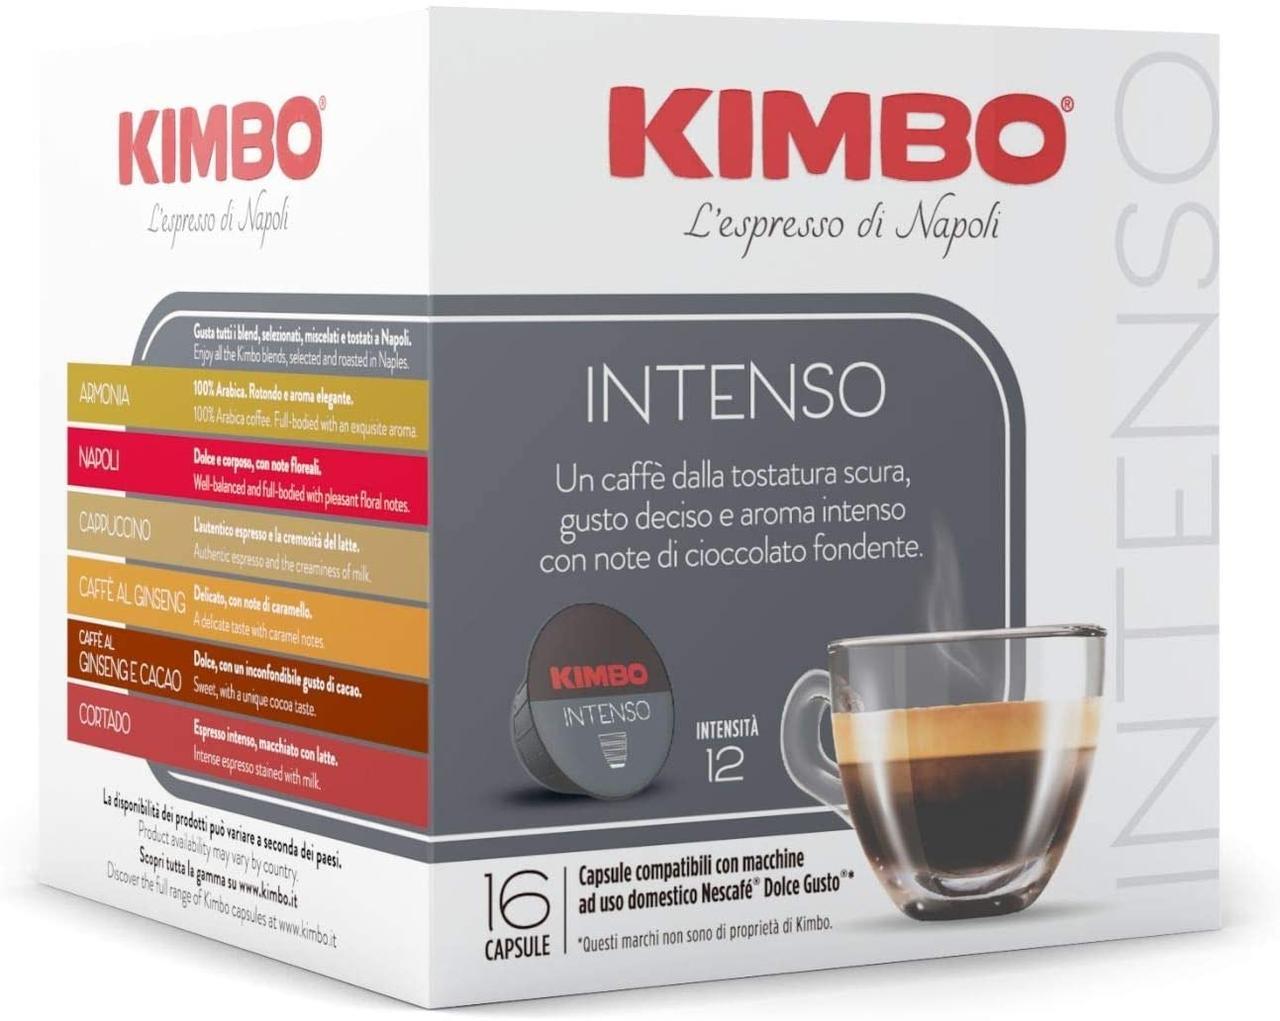 ПРИМЯТ УГОЛОК! Dolce Gusto KIMBO Intenso  - Дольче густо Кимбо Интенсо  (16 капсул = 16 порций)